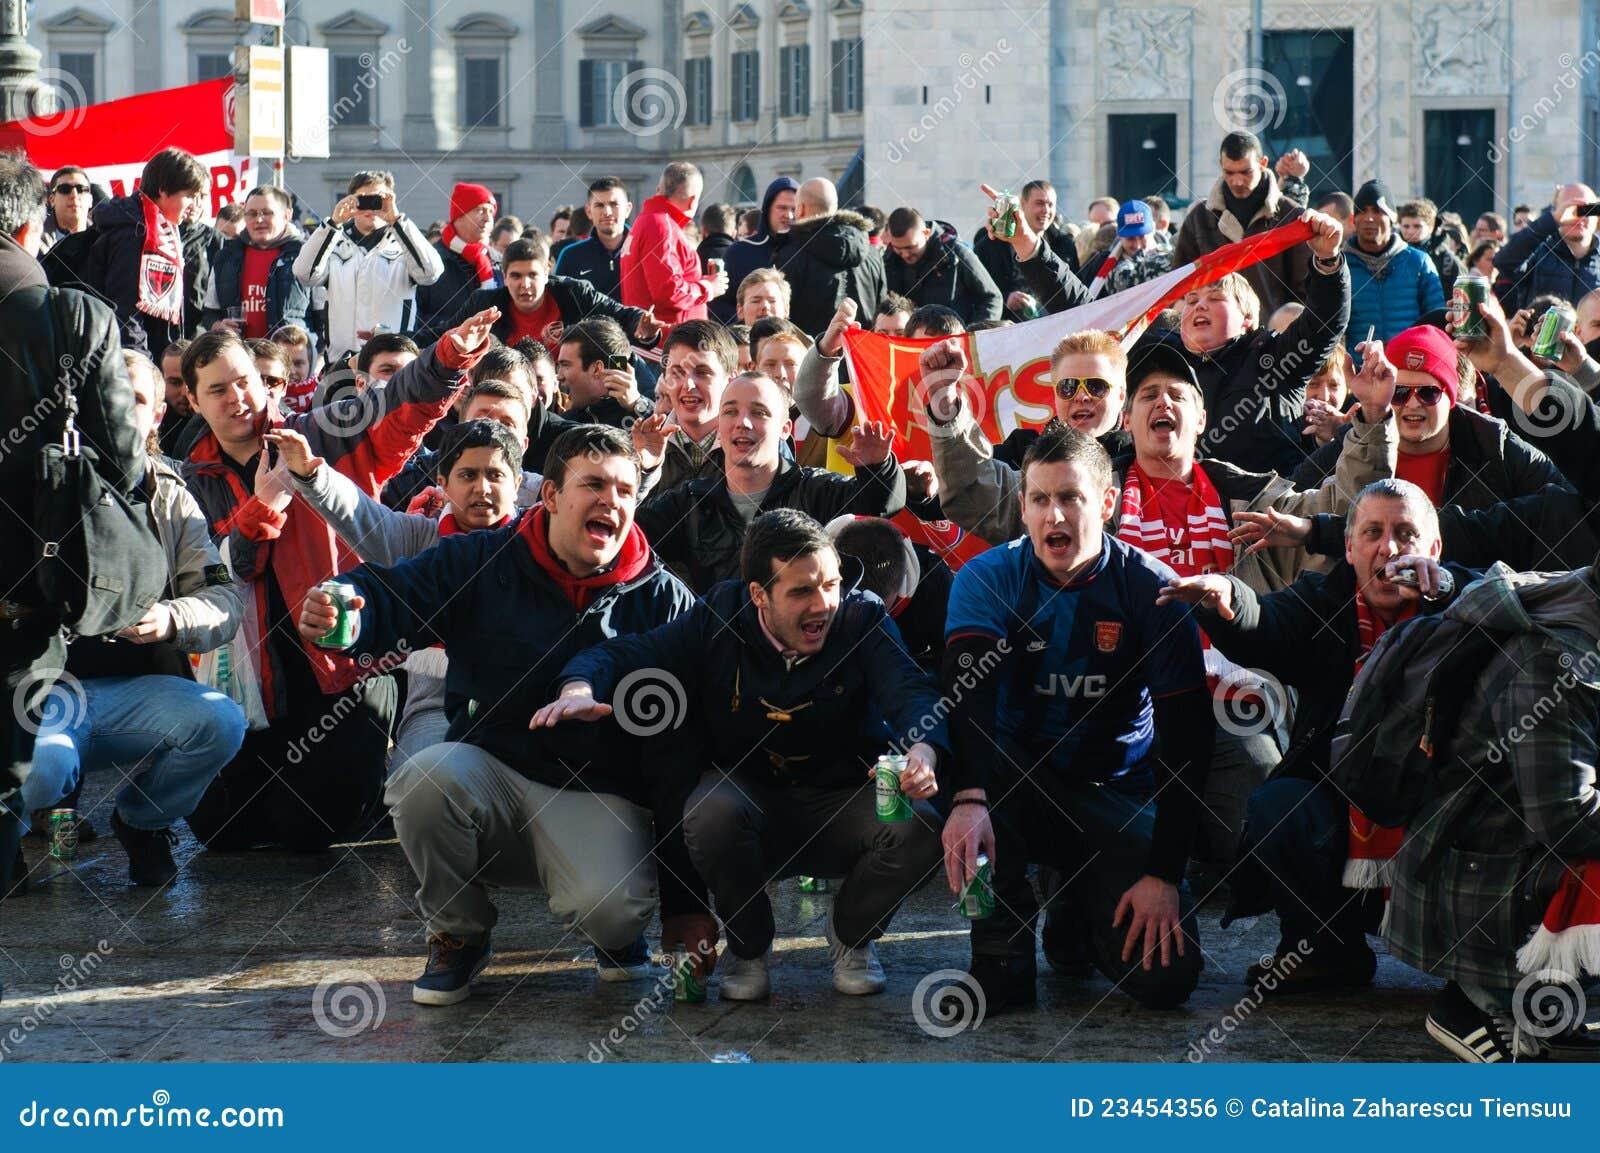 FC Köln supporters invade London! - YouTube